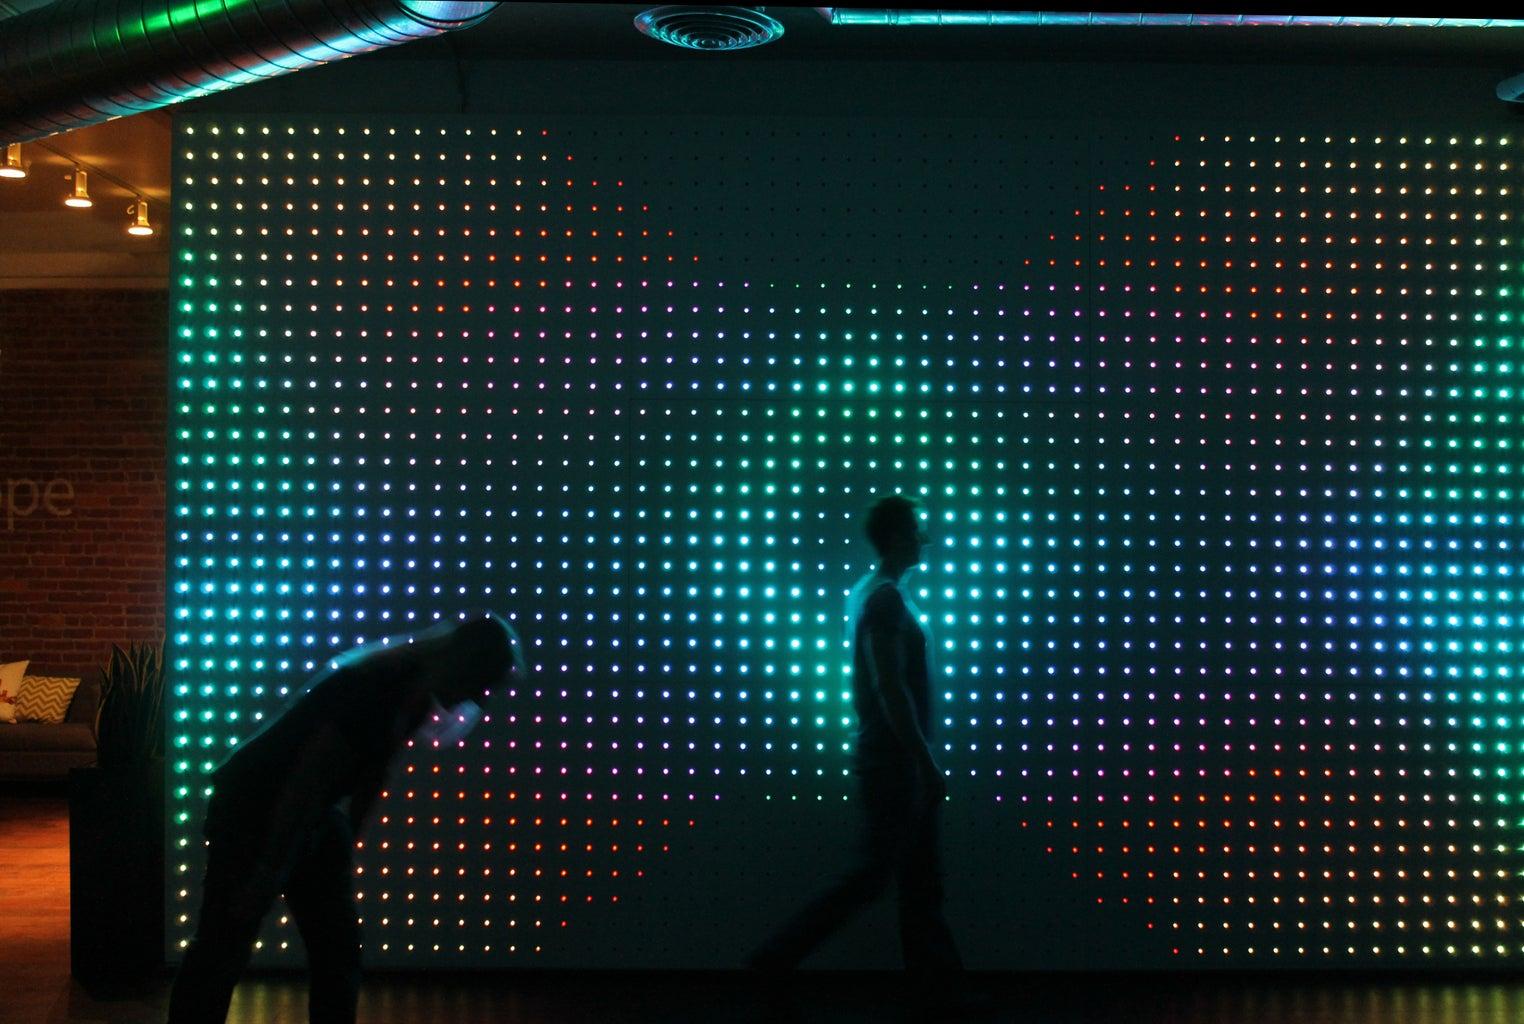 Make an Interactive IPad Controlled LED Wall